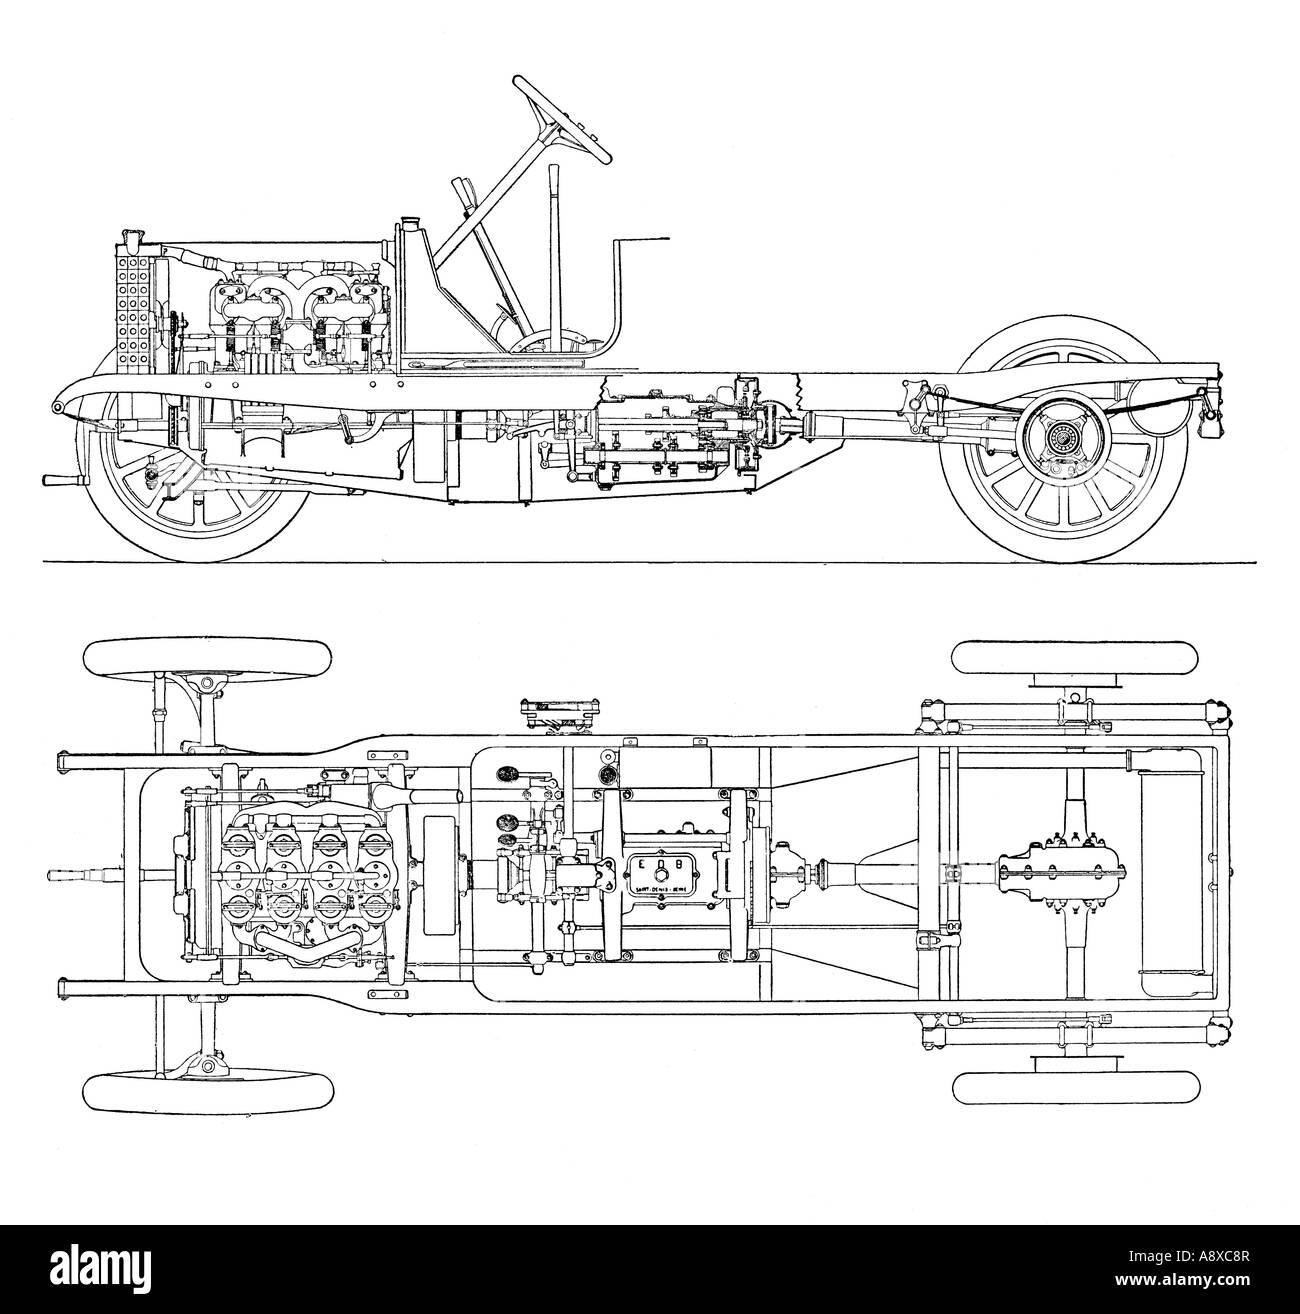 2005 Jeep Liberty Drivetrain Parts Diagram Engine Part